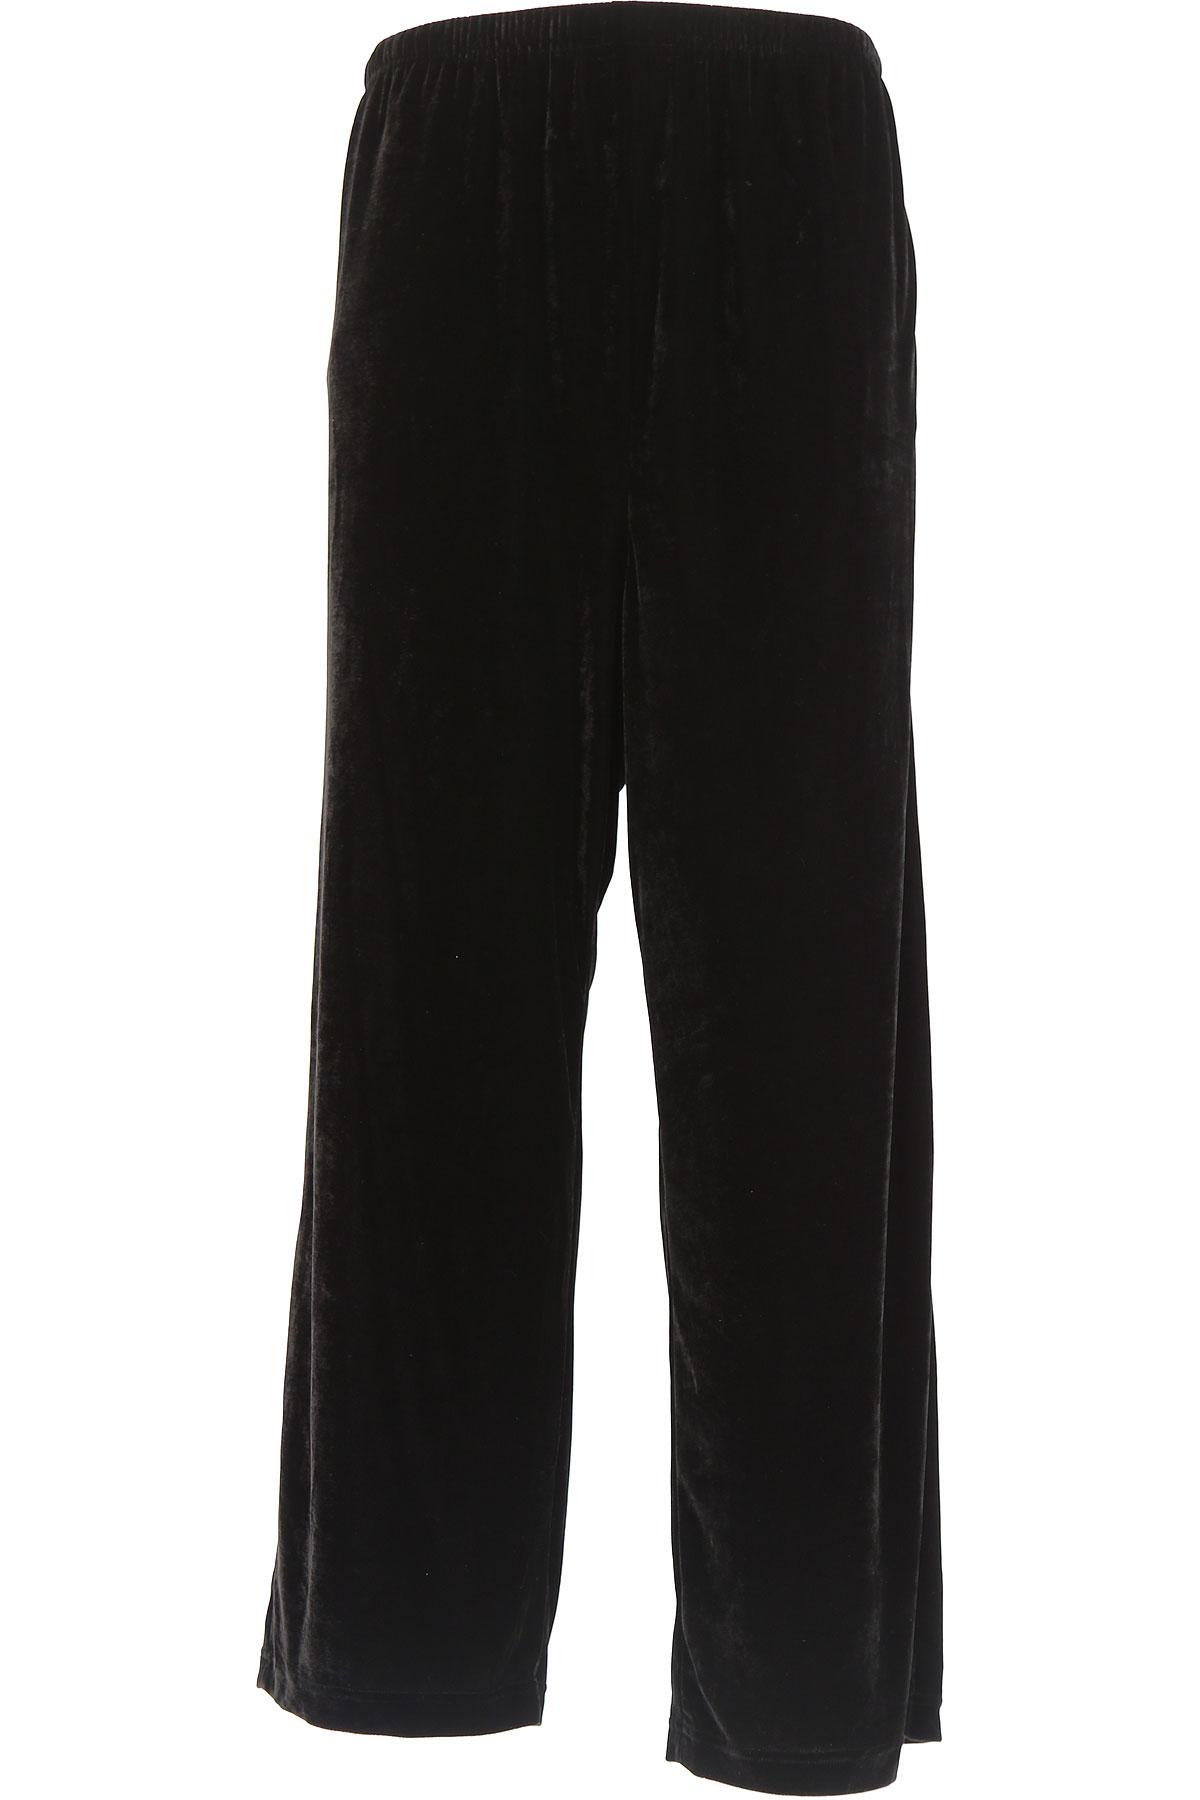 Image of Balenciaga Pants for Men, Black, polyester, 2017, 30 32 34